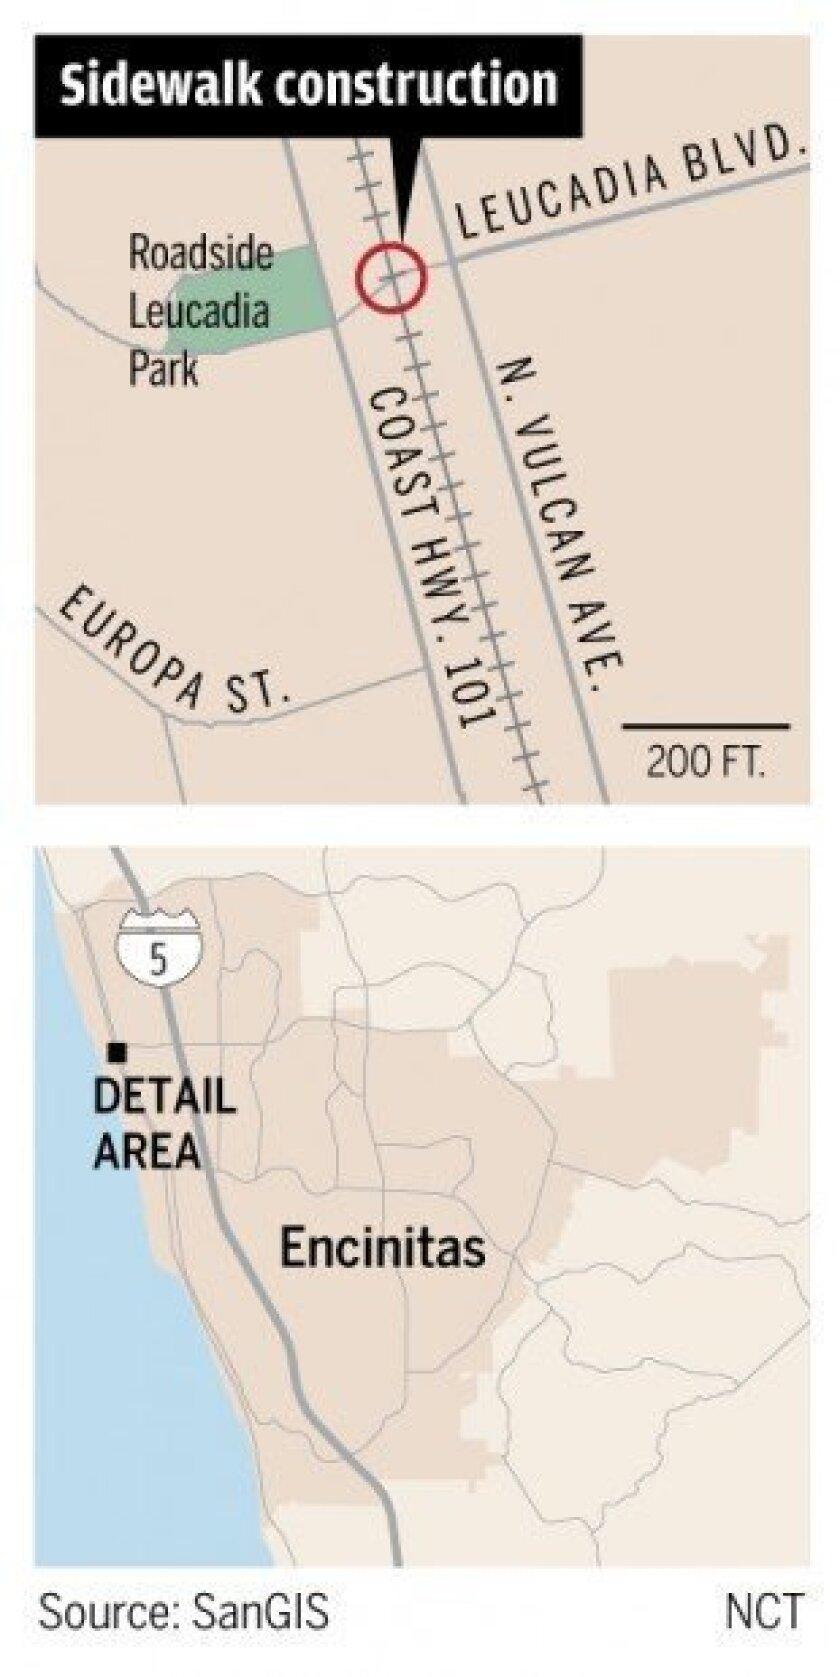 ENCINITAS: City overhauls railroad crossing - The San go ... on ma railroad map, gt railroad map, nys&w railroad map, sp railroad map,